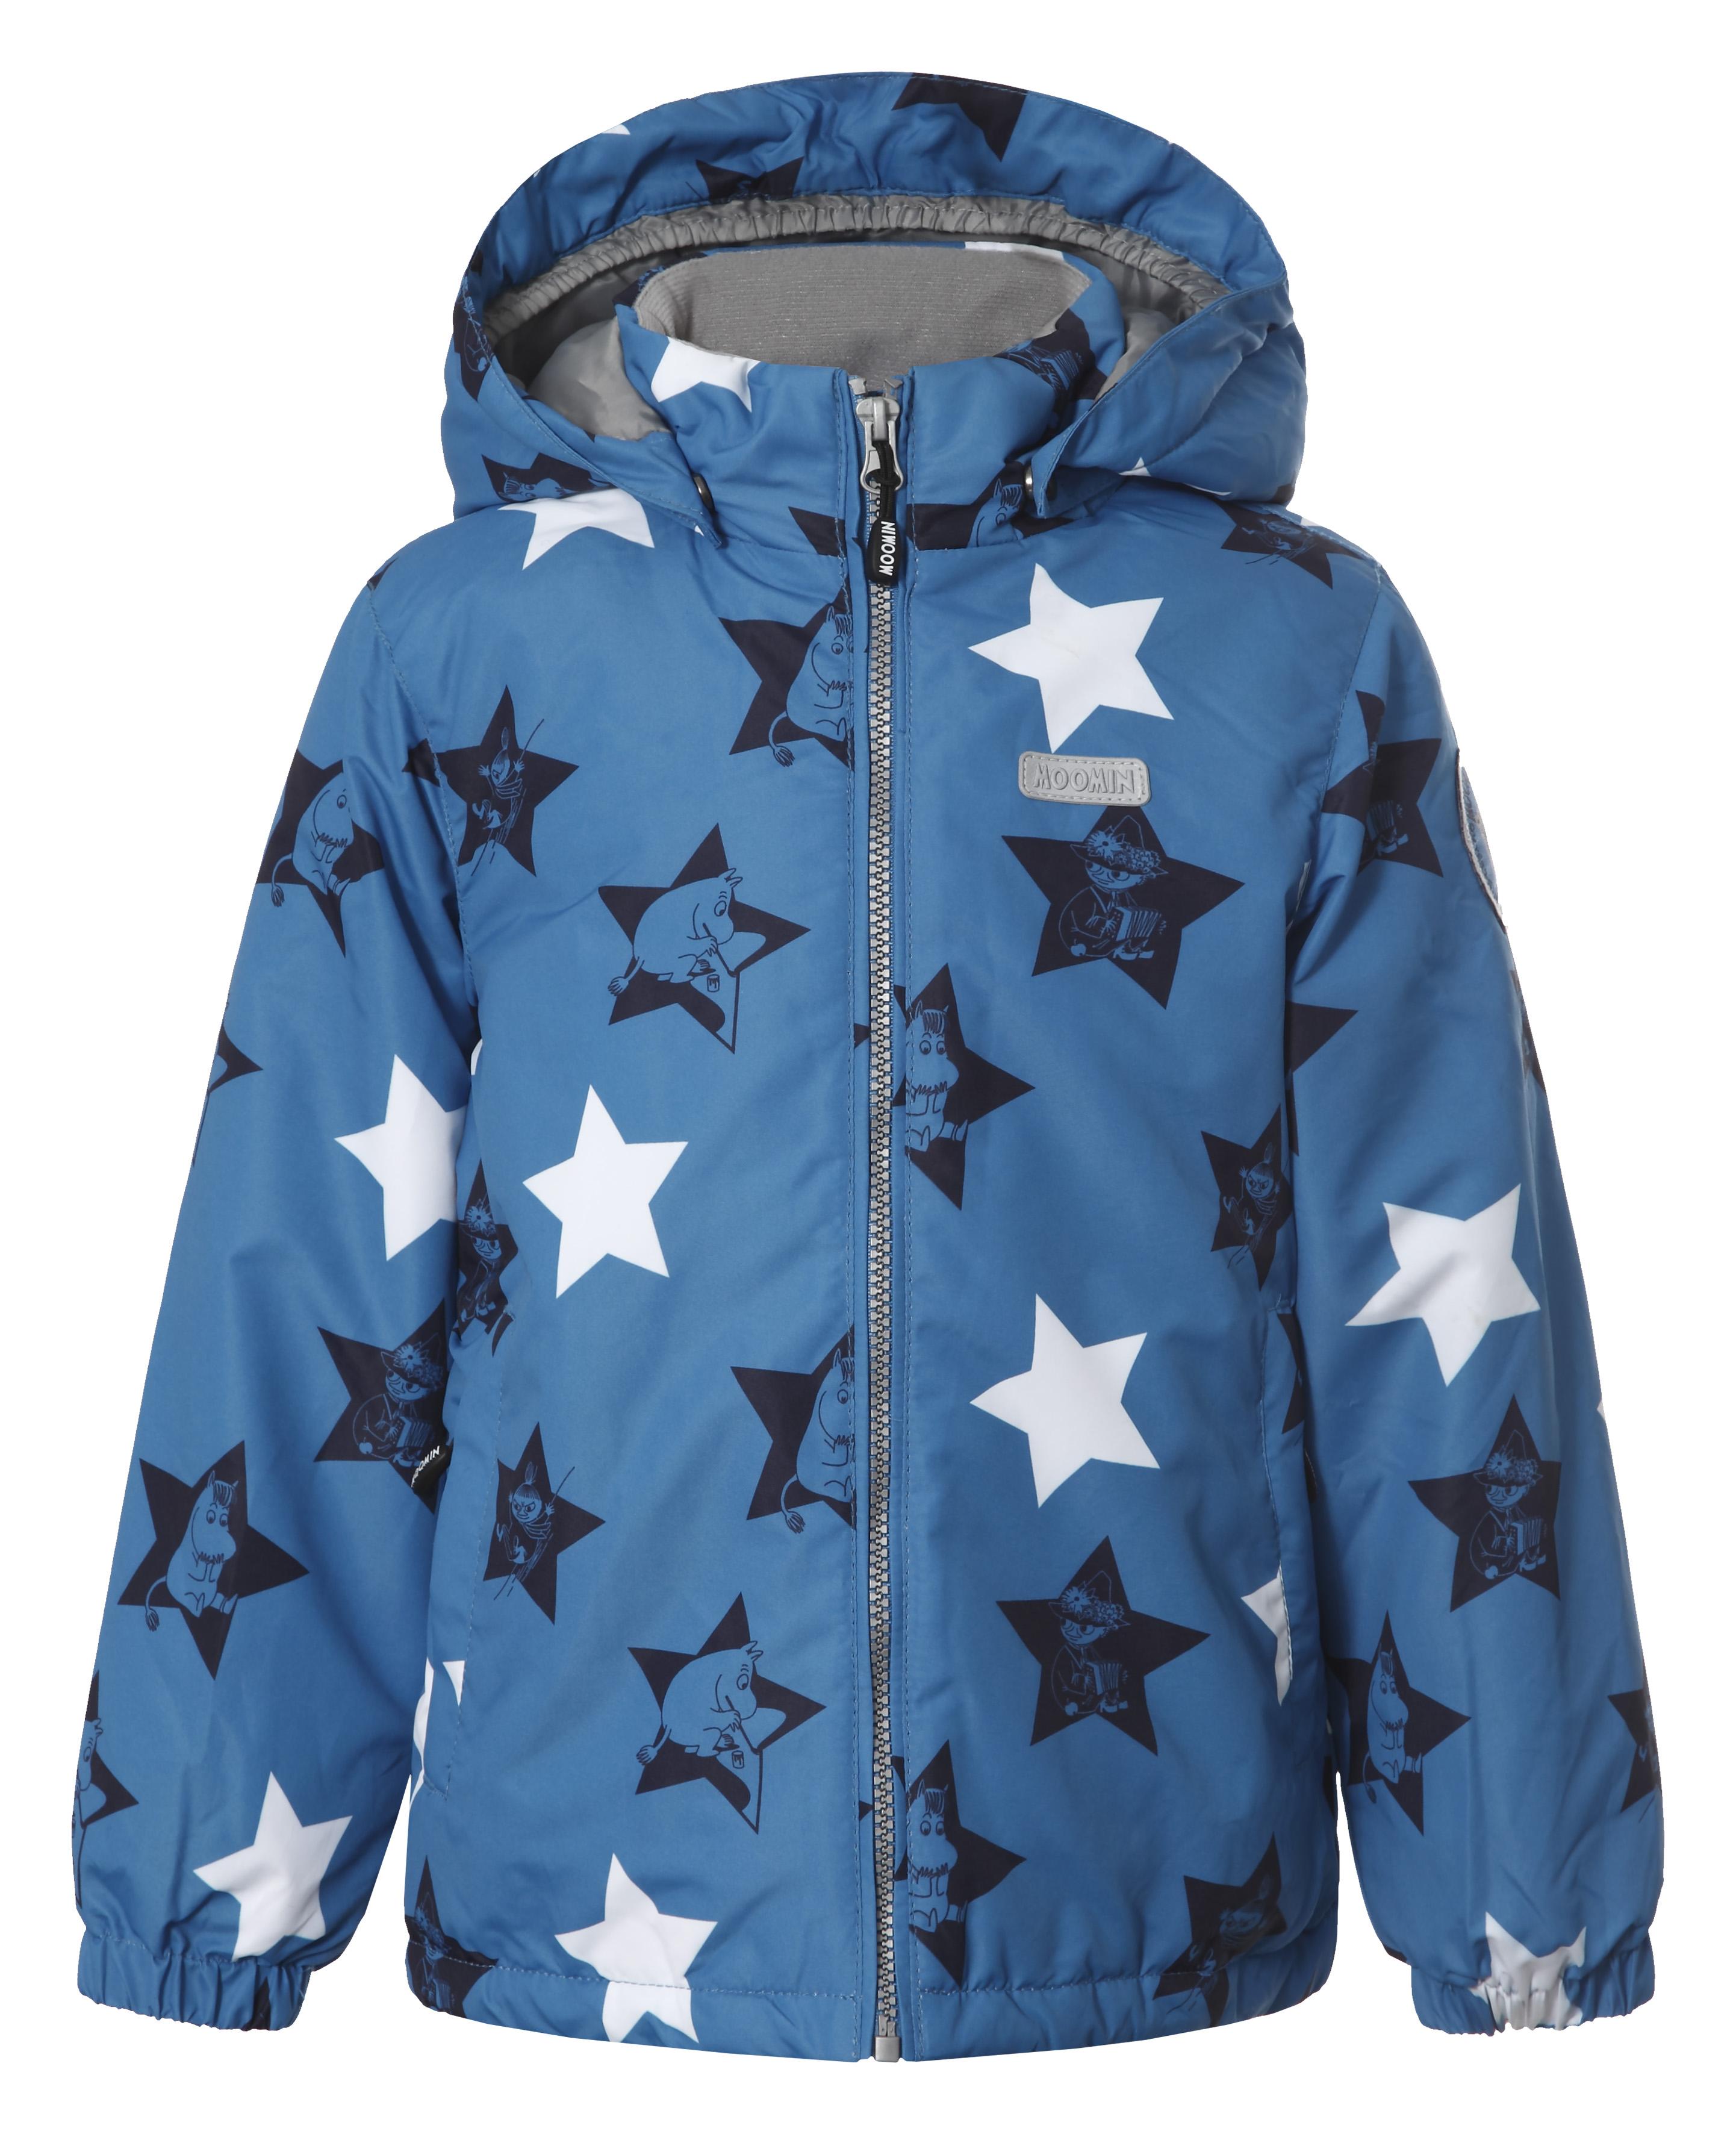 L-Fashion Group Oy - Boys Padded Jacket